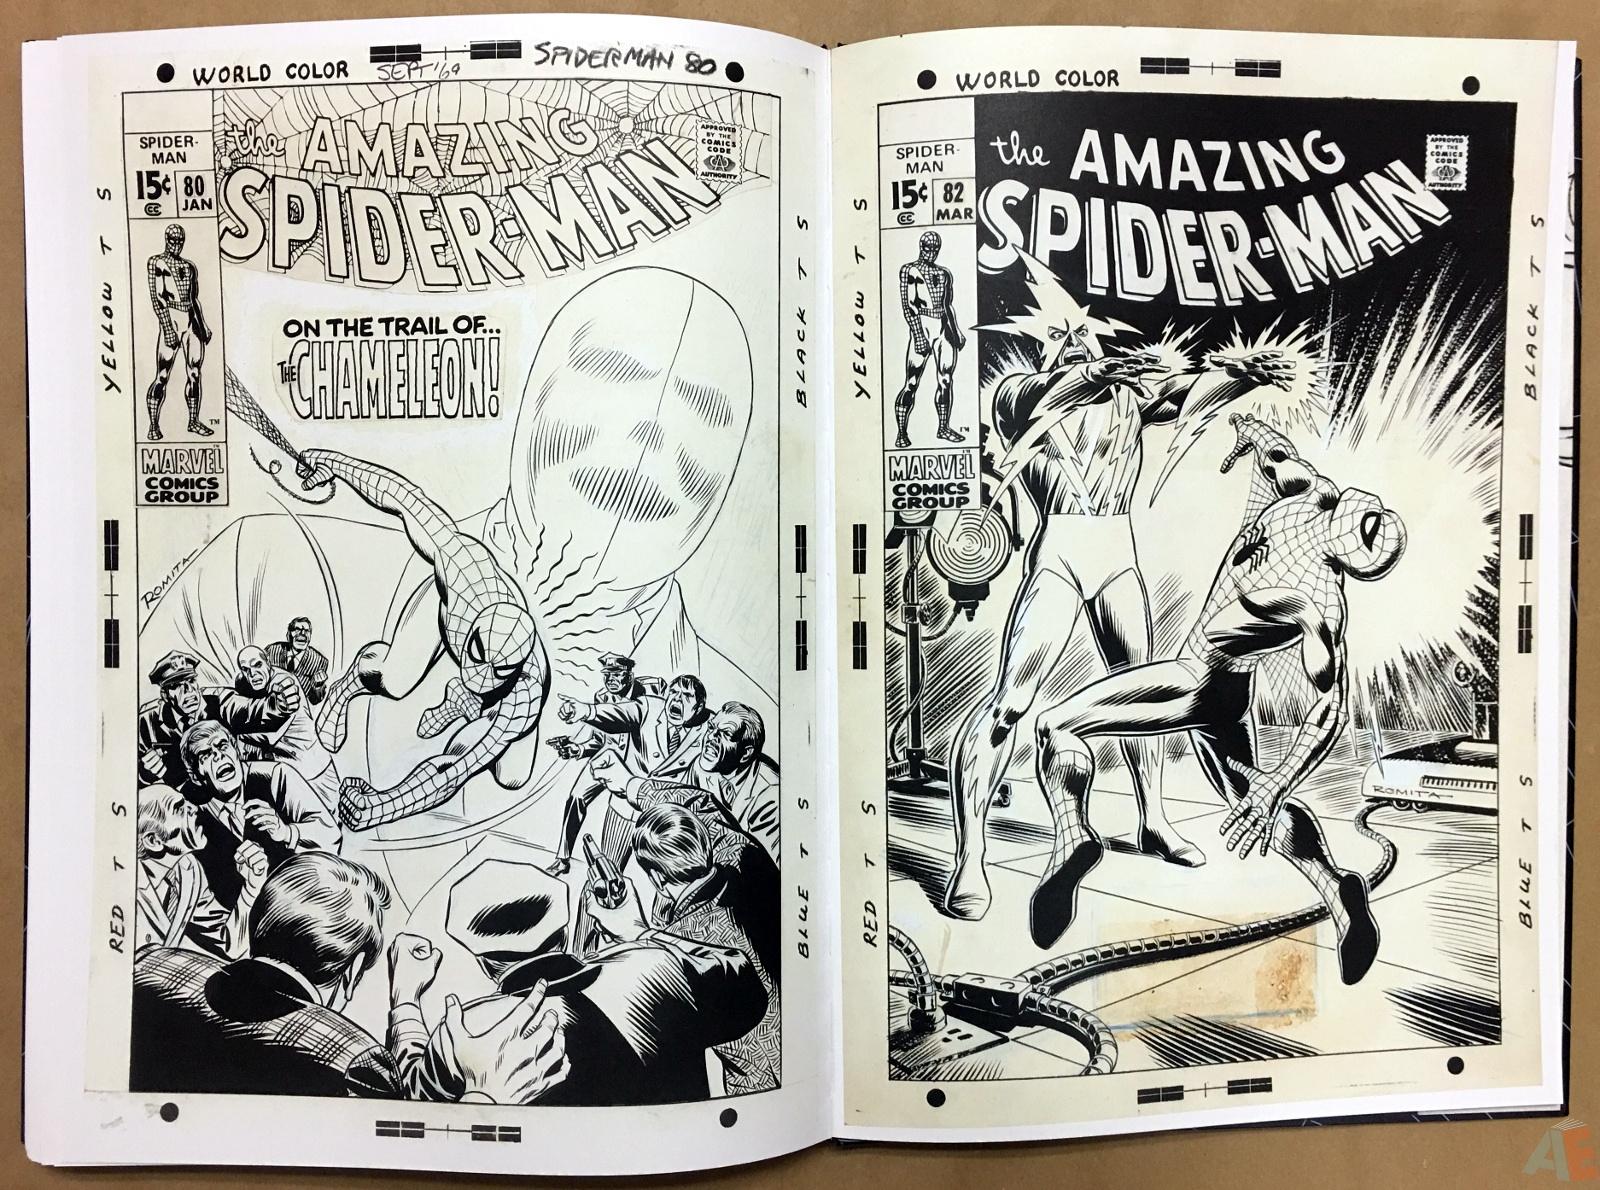 John Romita's The Amazing Spider-Man Artist's Edition 56